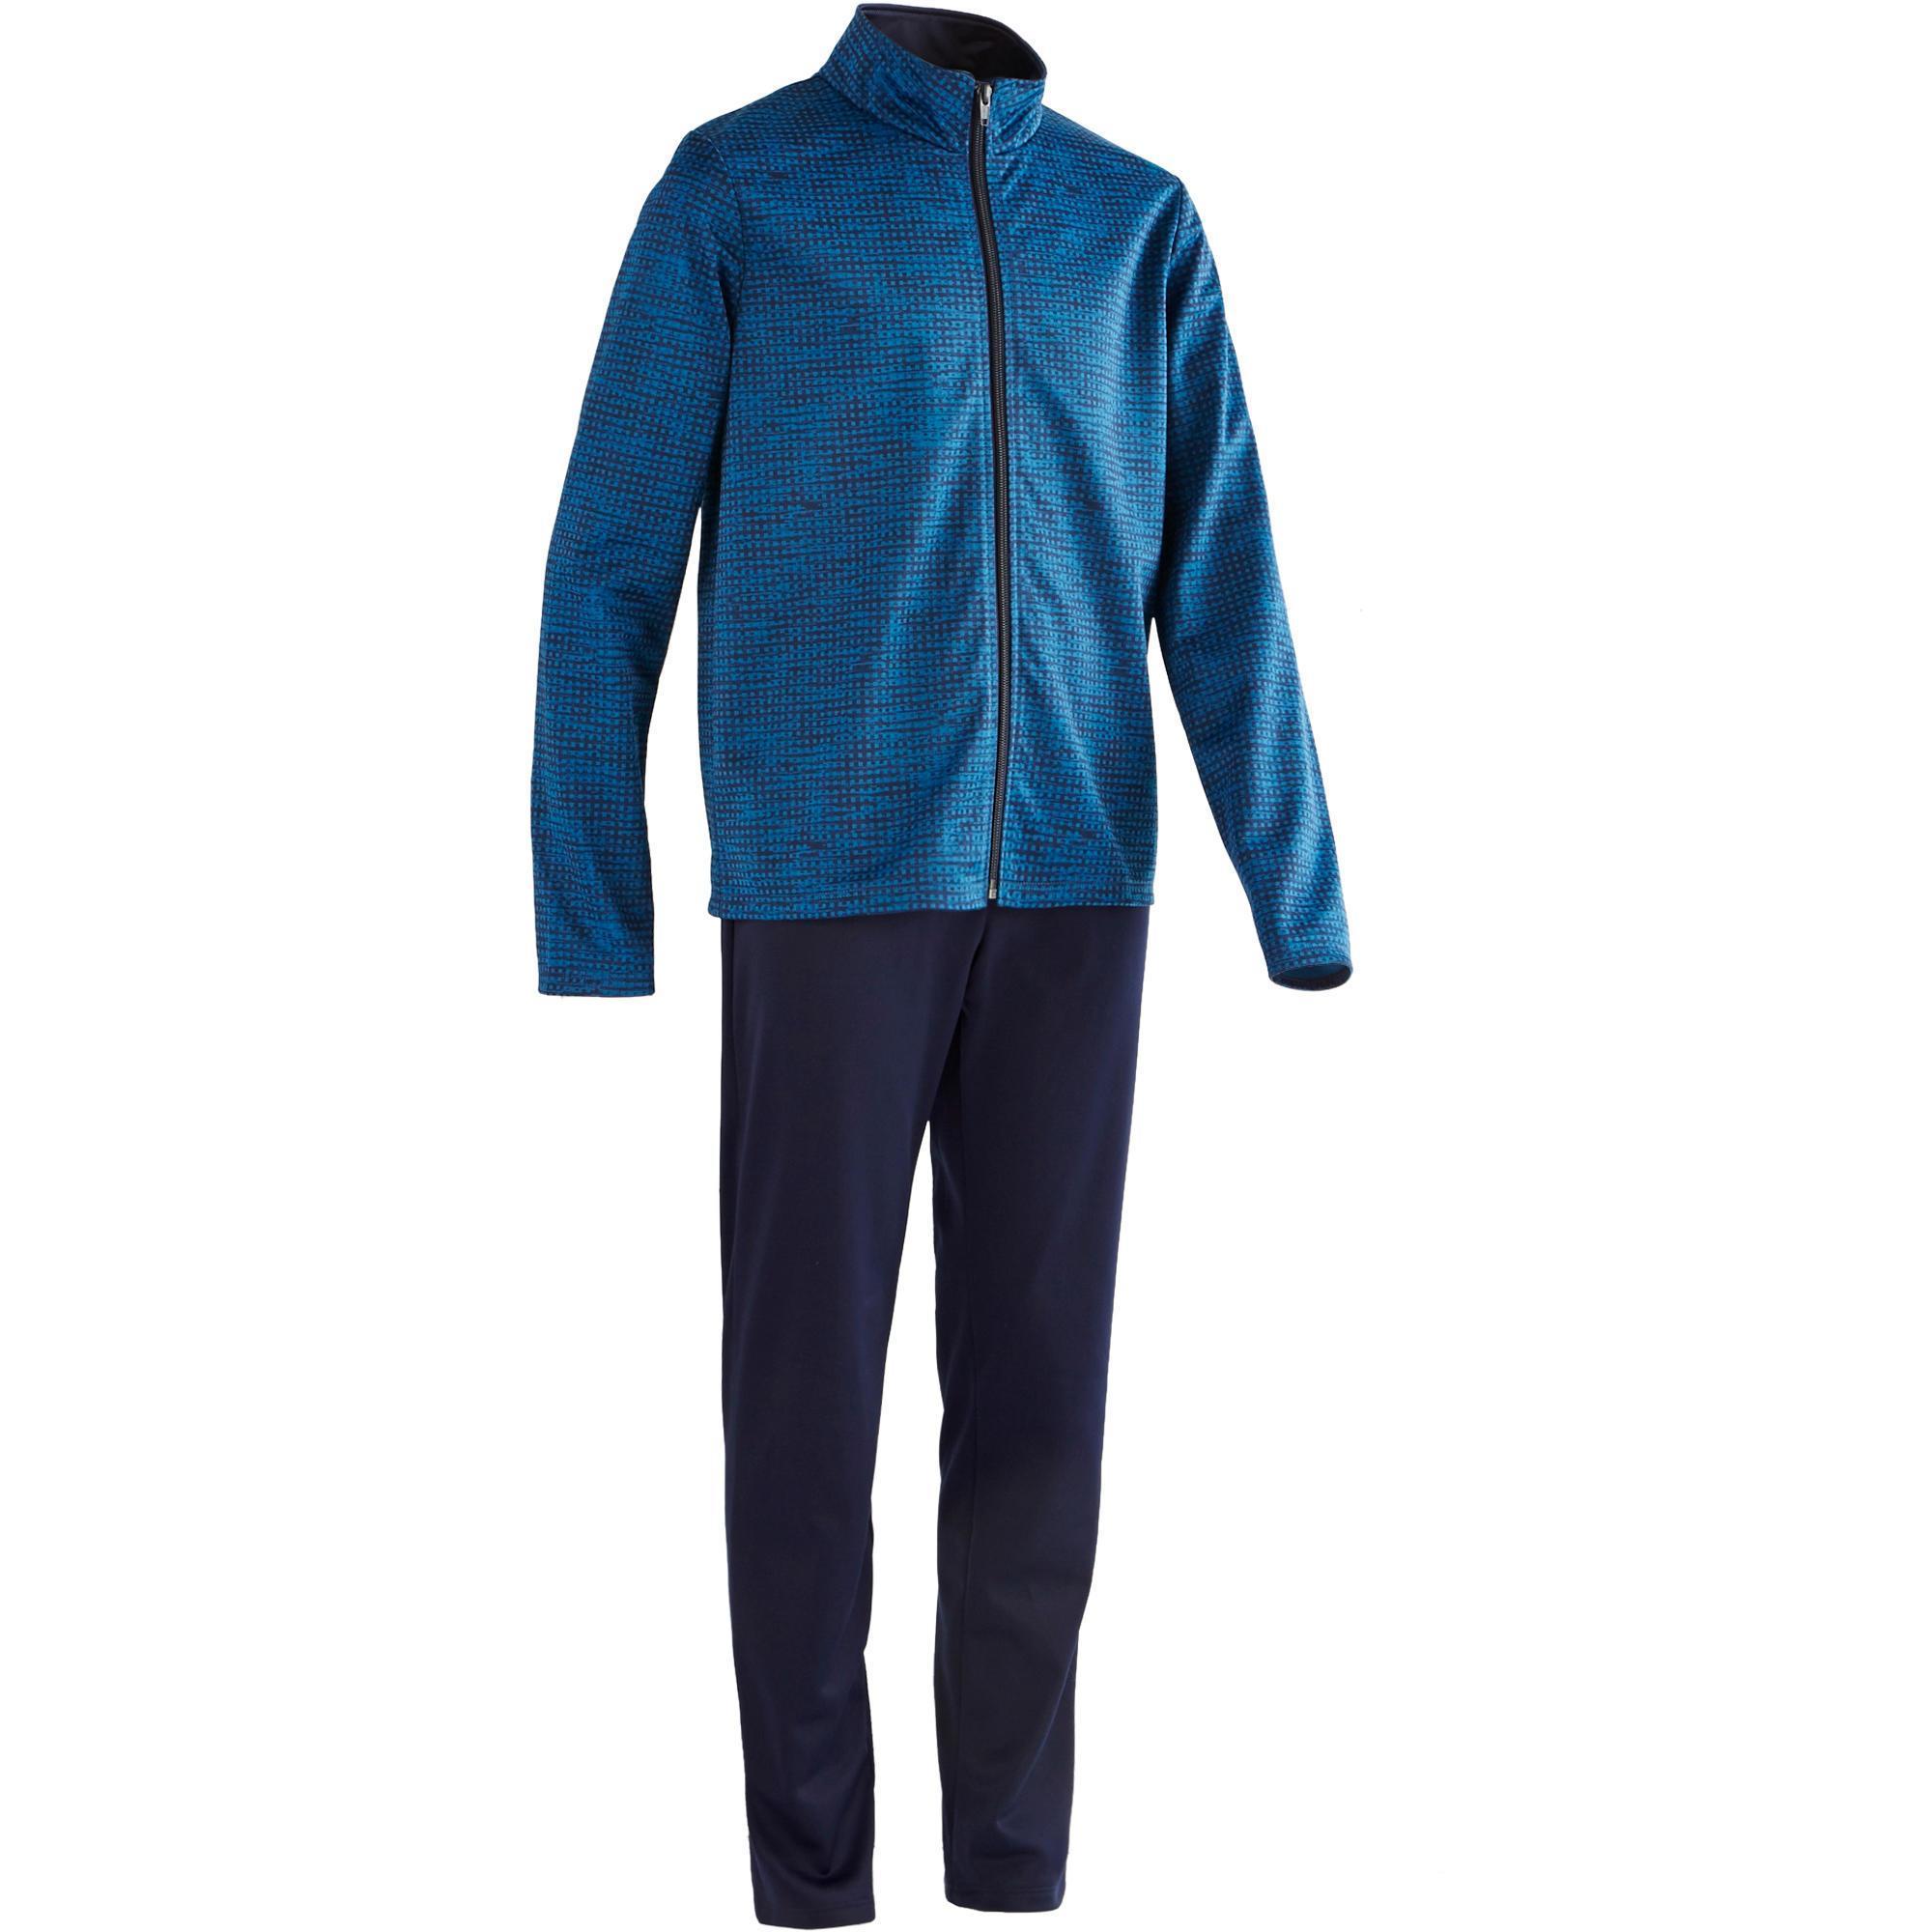 Domyos Gym trainingspak voor jongens Gym'y print blauw